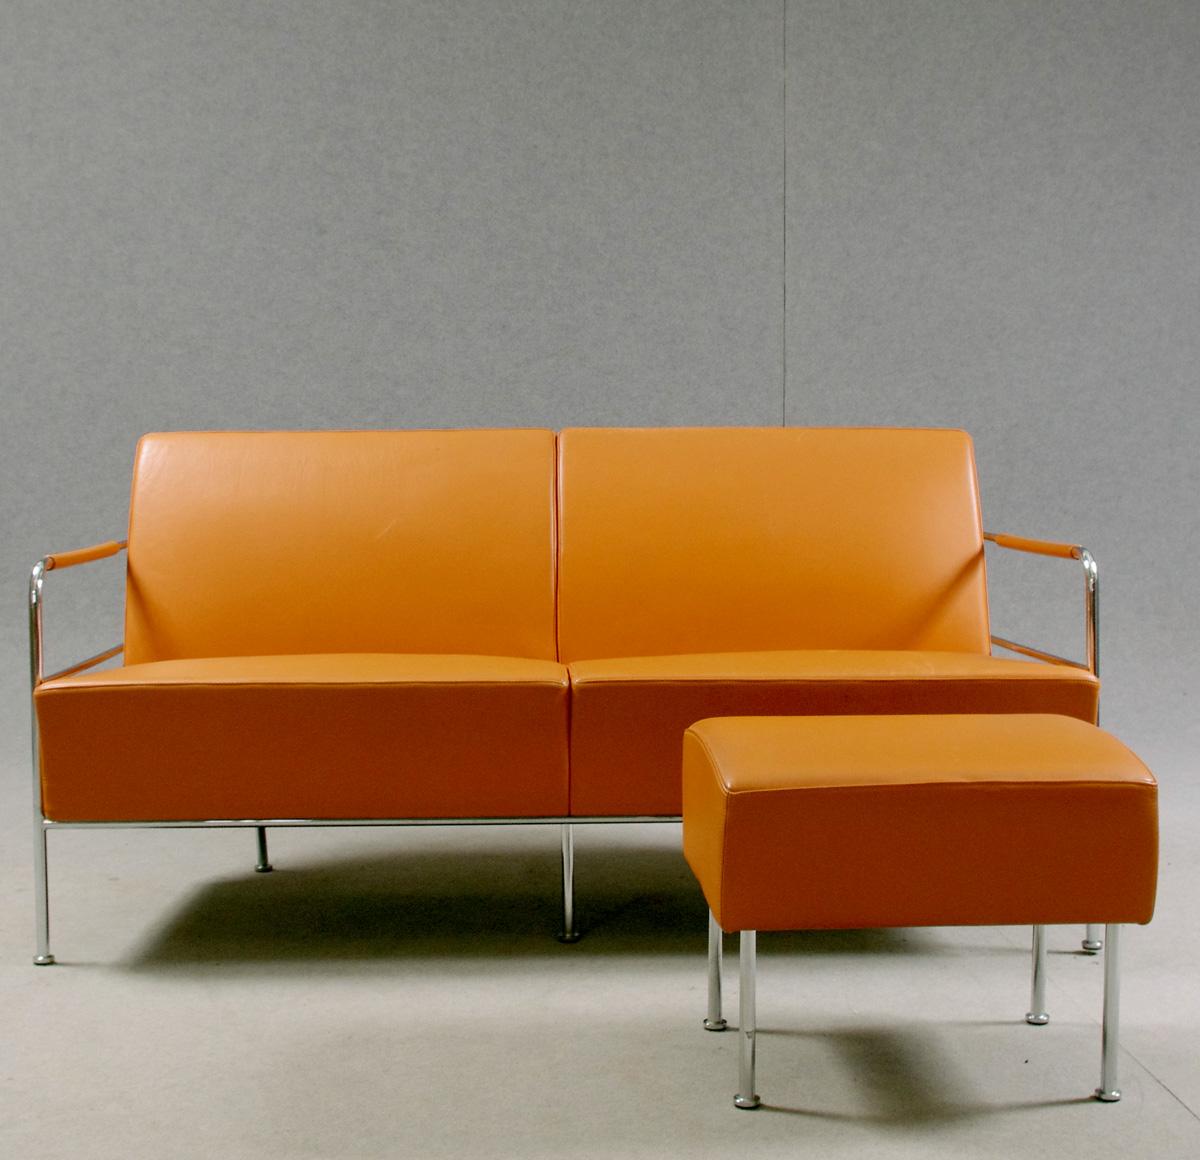 cinema soffa sofa 3d model avangarde corner sofa. Black Bedroom Furniture Sets. Home Design Ideas